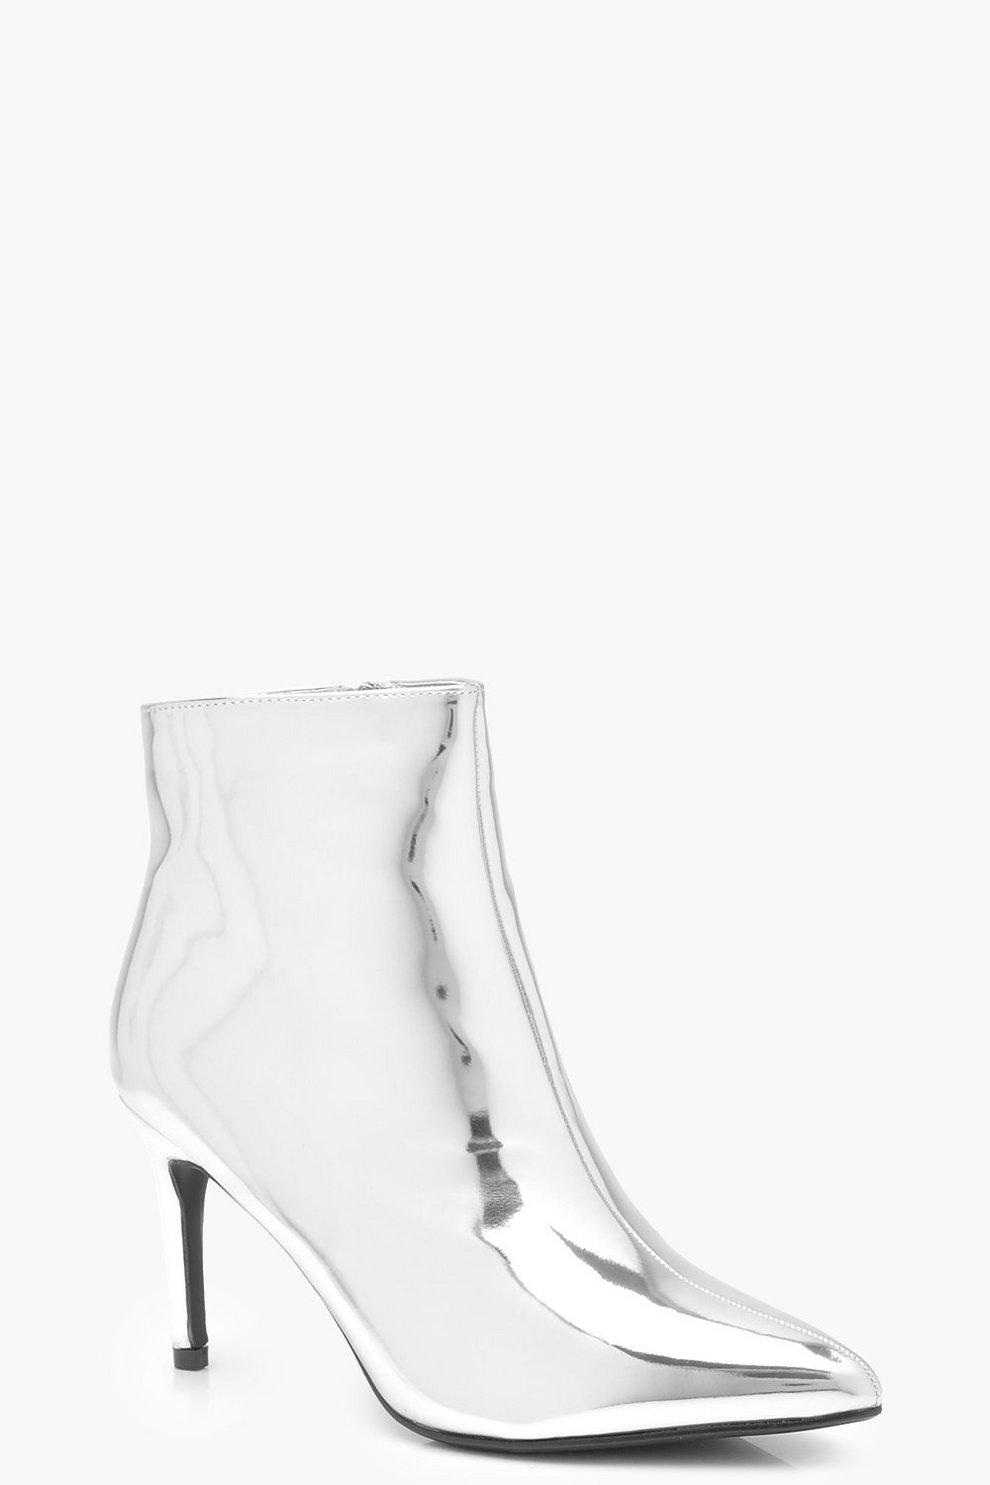 45031e774b4 Womens Silver Pointed Toe Stiletto Shoe Boots